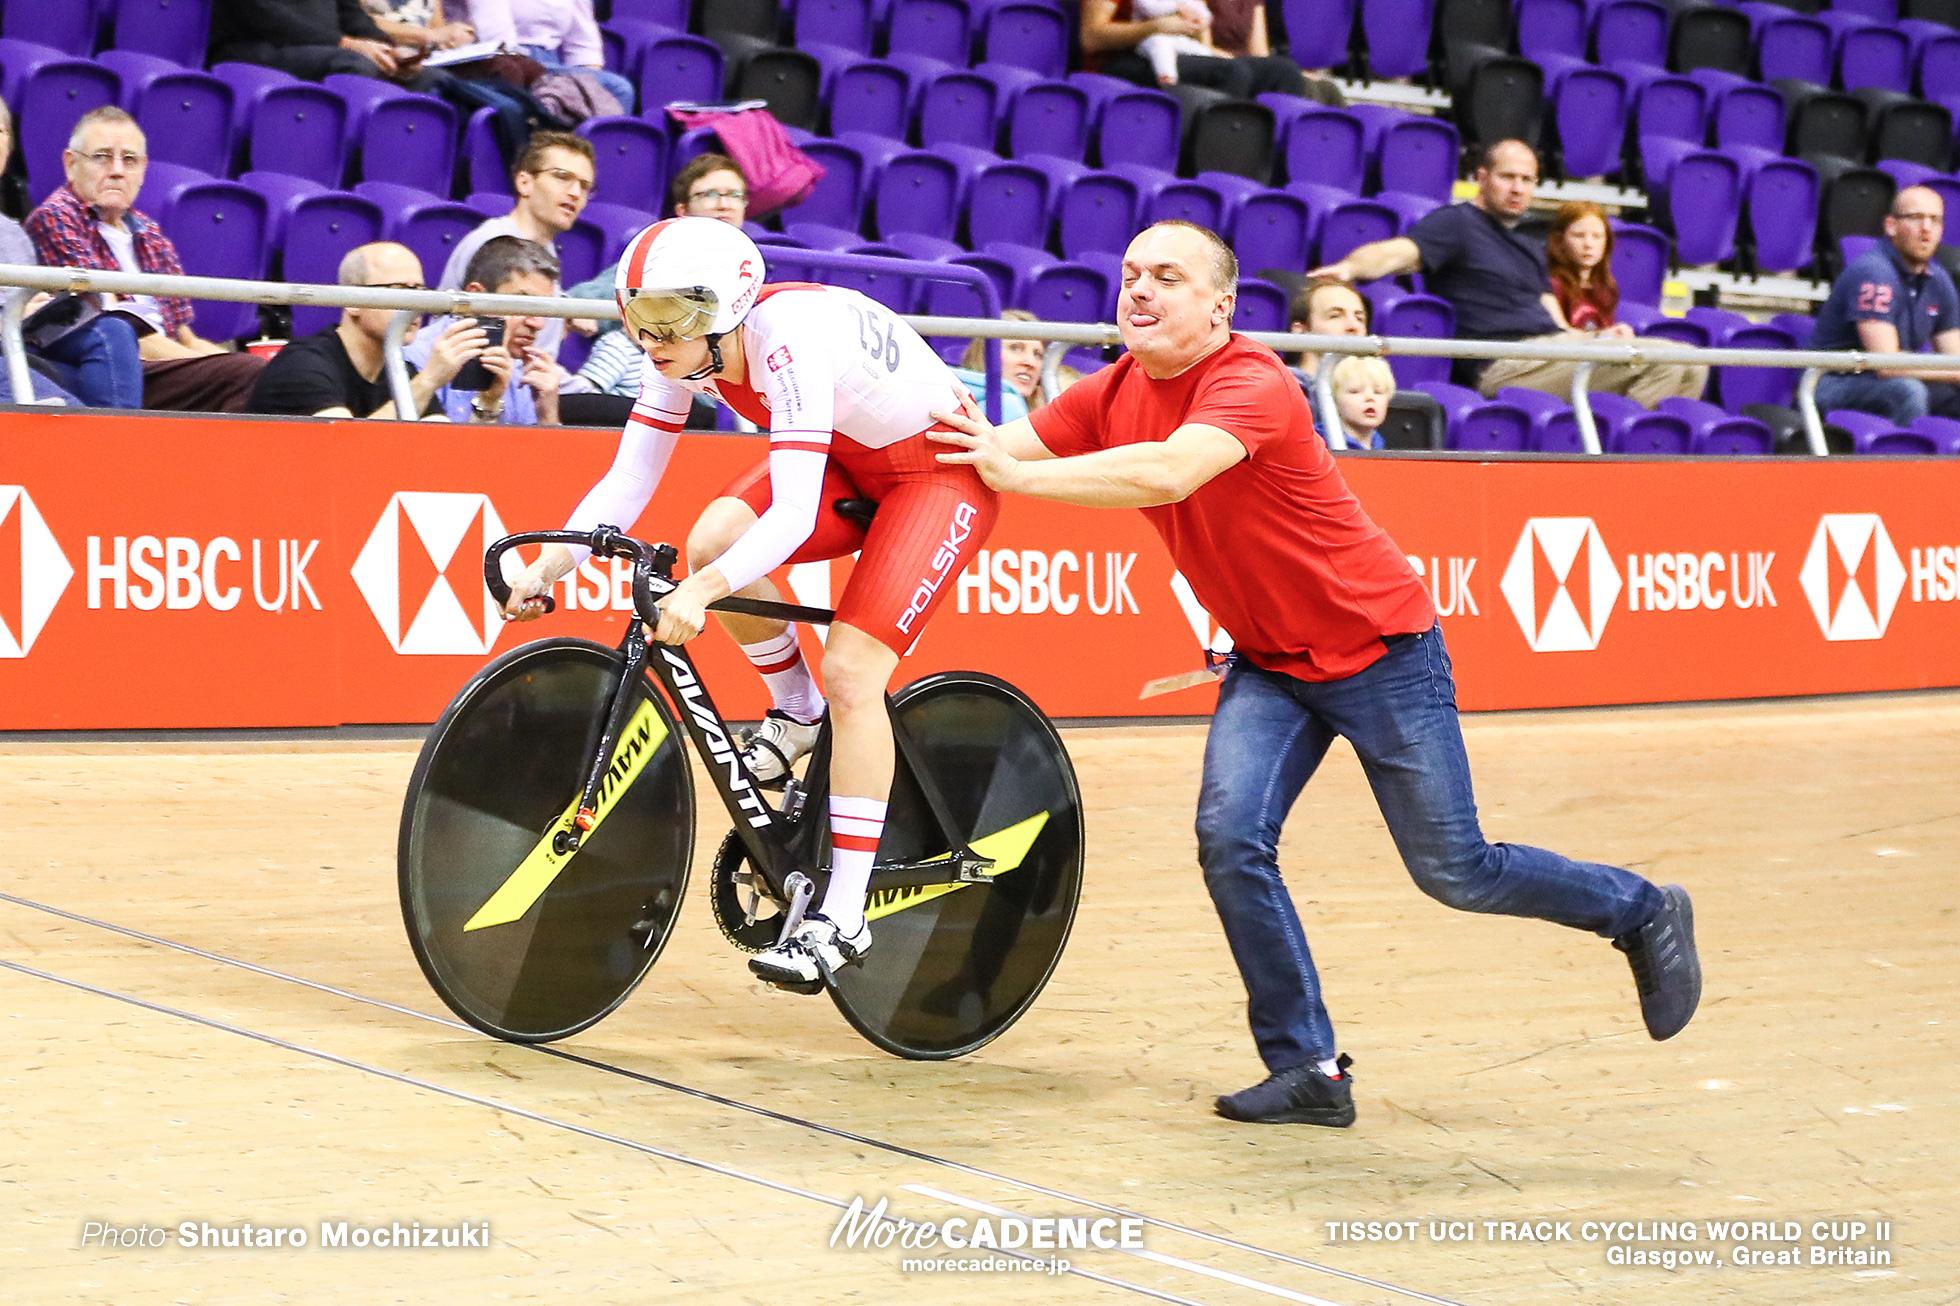 Qualifying / Women's Sprint / TISSOT UCI TRACK CYCLING WORLD CUP II, Glasgow, Great Britain, Marlena KARWACKA マルレーナ・カワバツカ